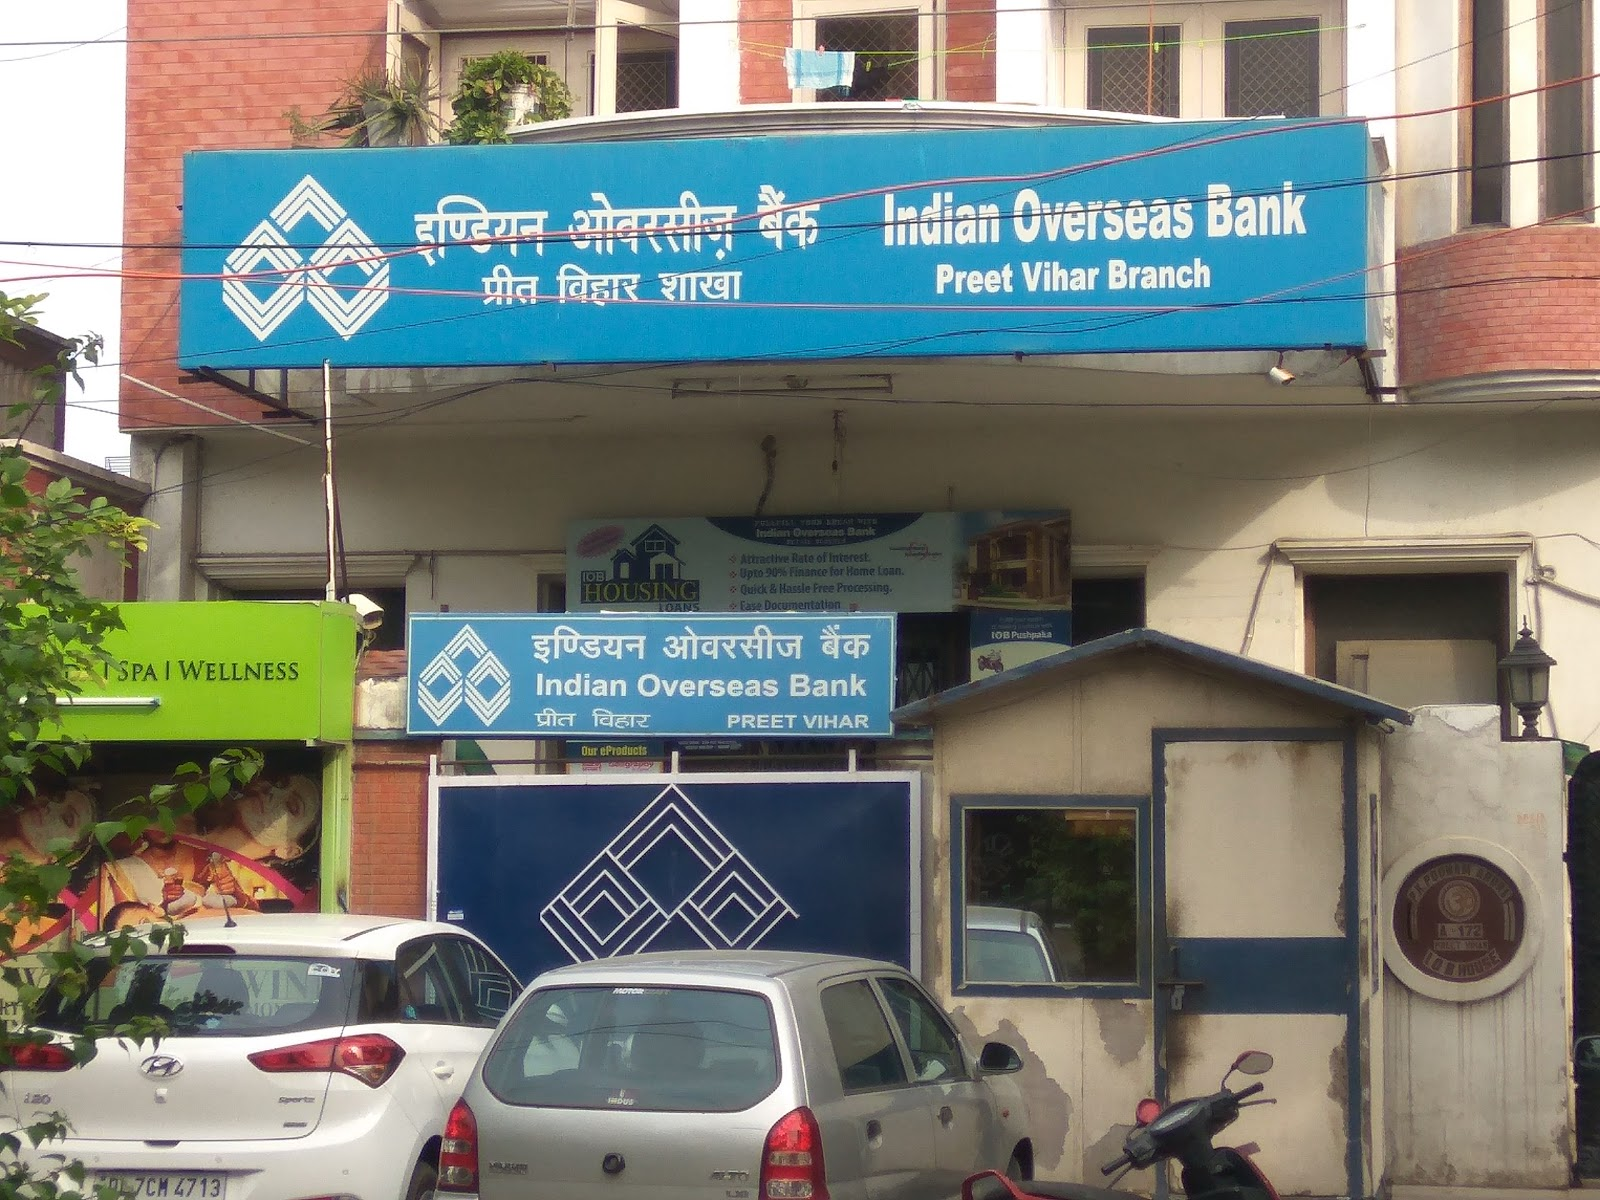 blood bank Indian Overseas Bank near Delhi Delhi